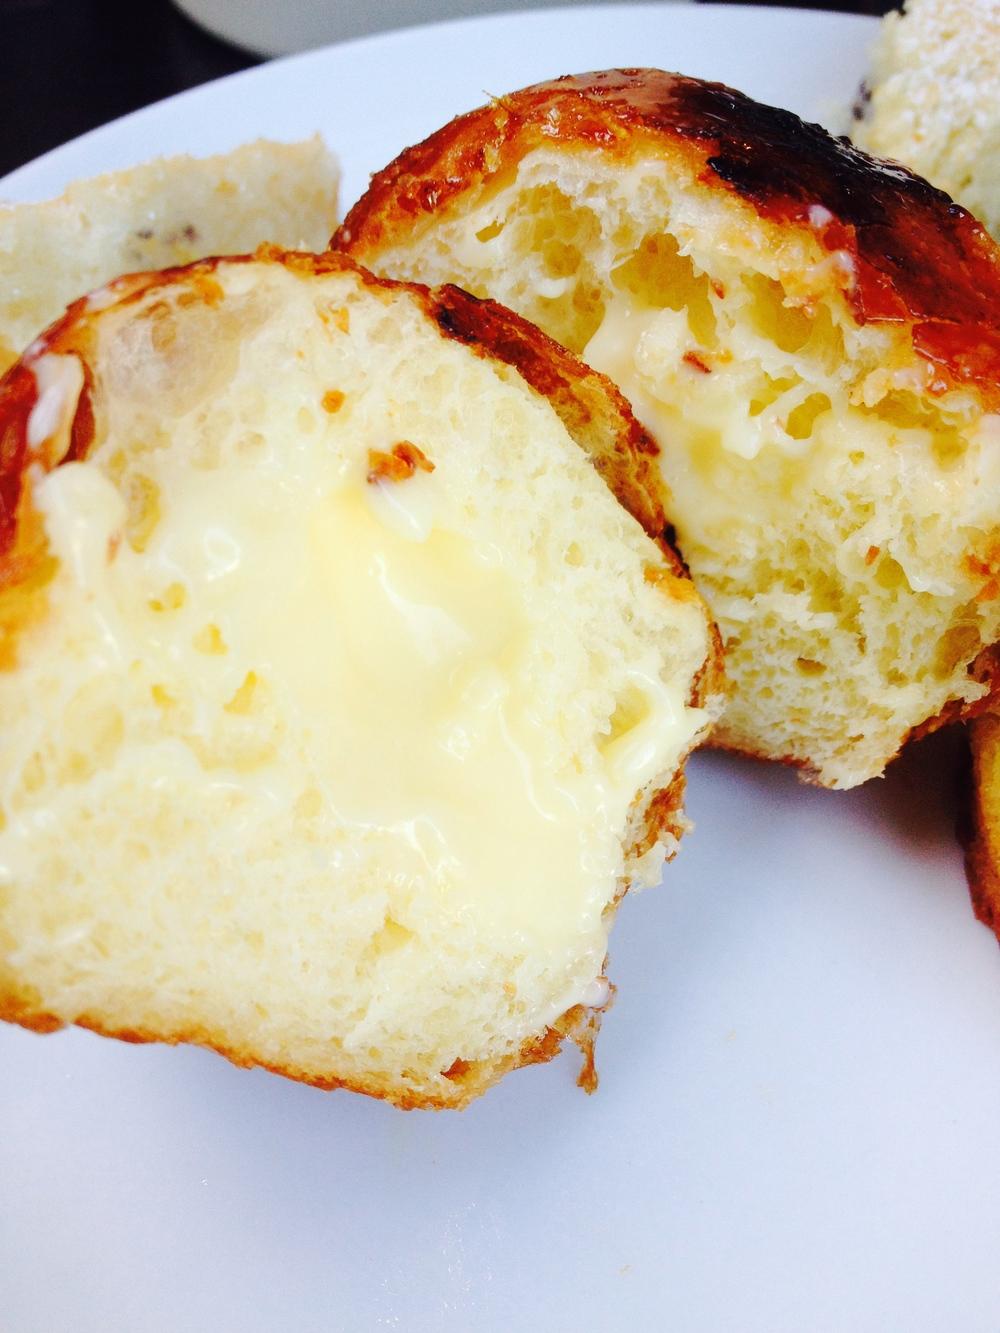 Inside view of the amazing custard-filled crème  brûlée bombolini